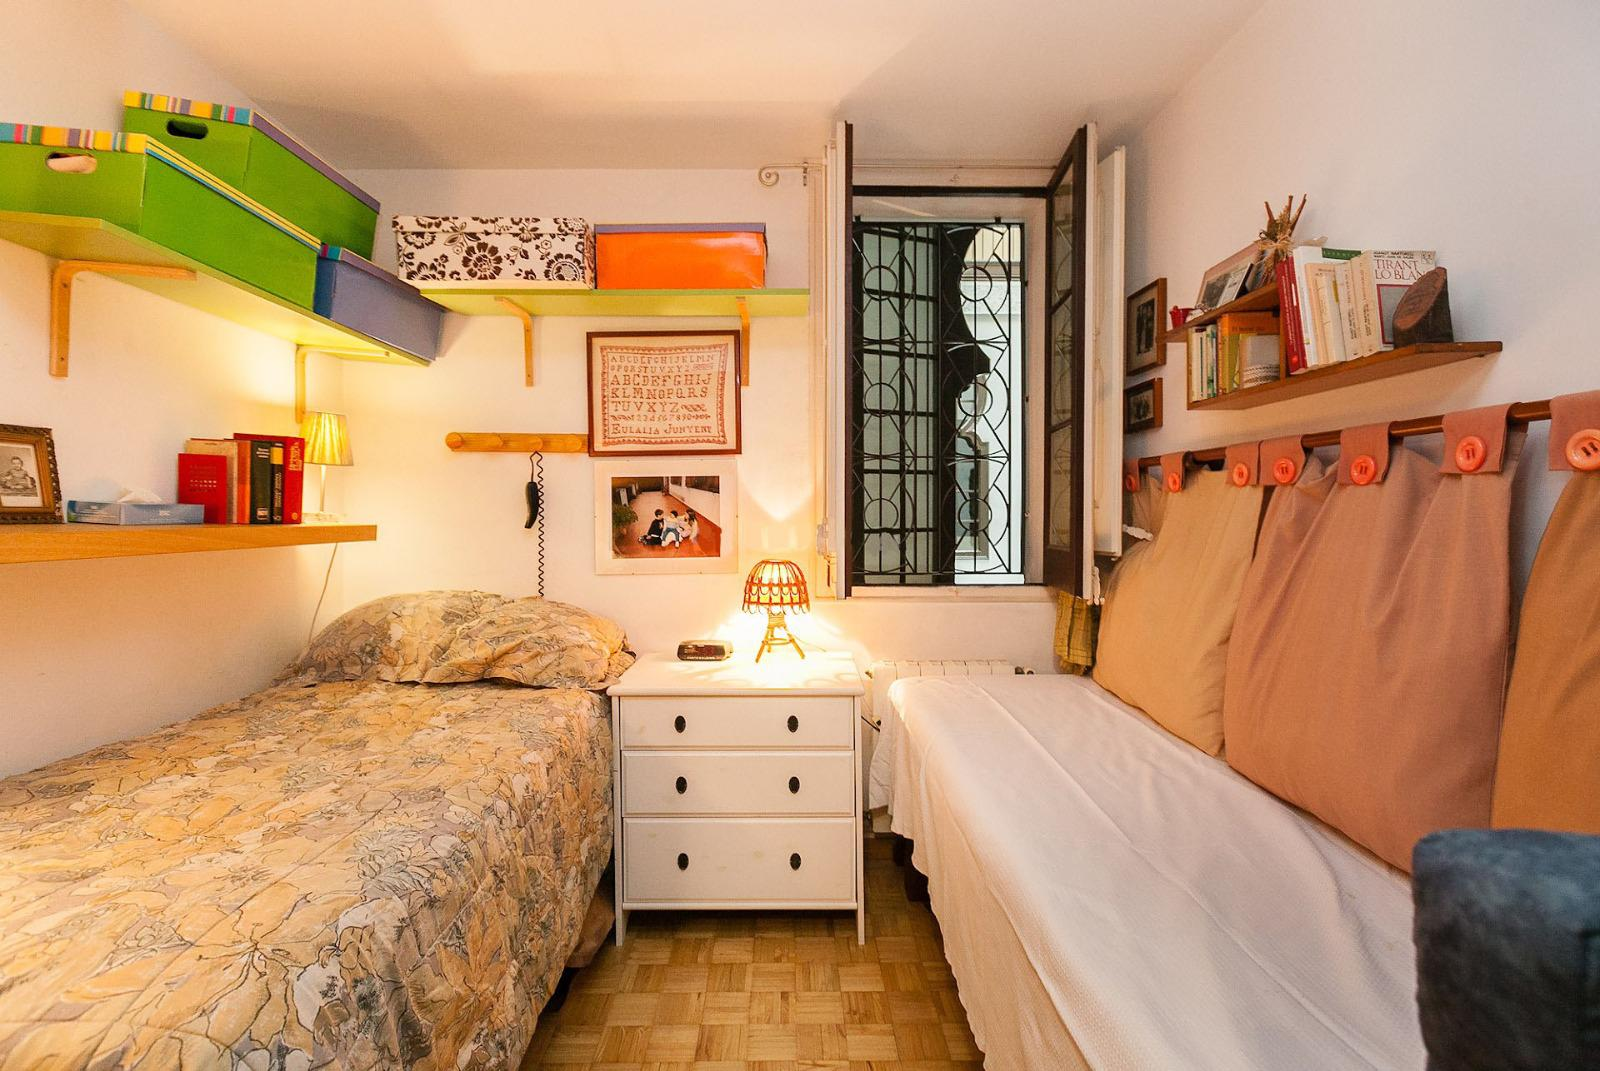 247916 Flat for sale in Sarrià-Sant Gervasi, Sant Gervasi-Galvany 17